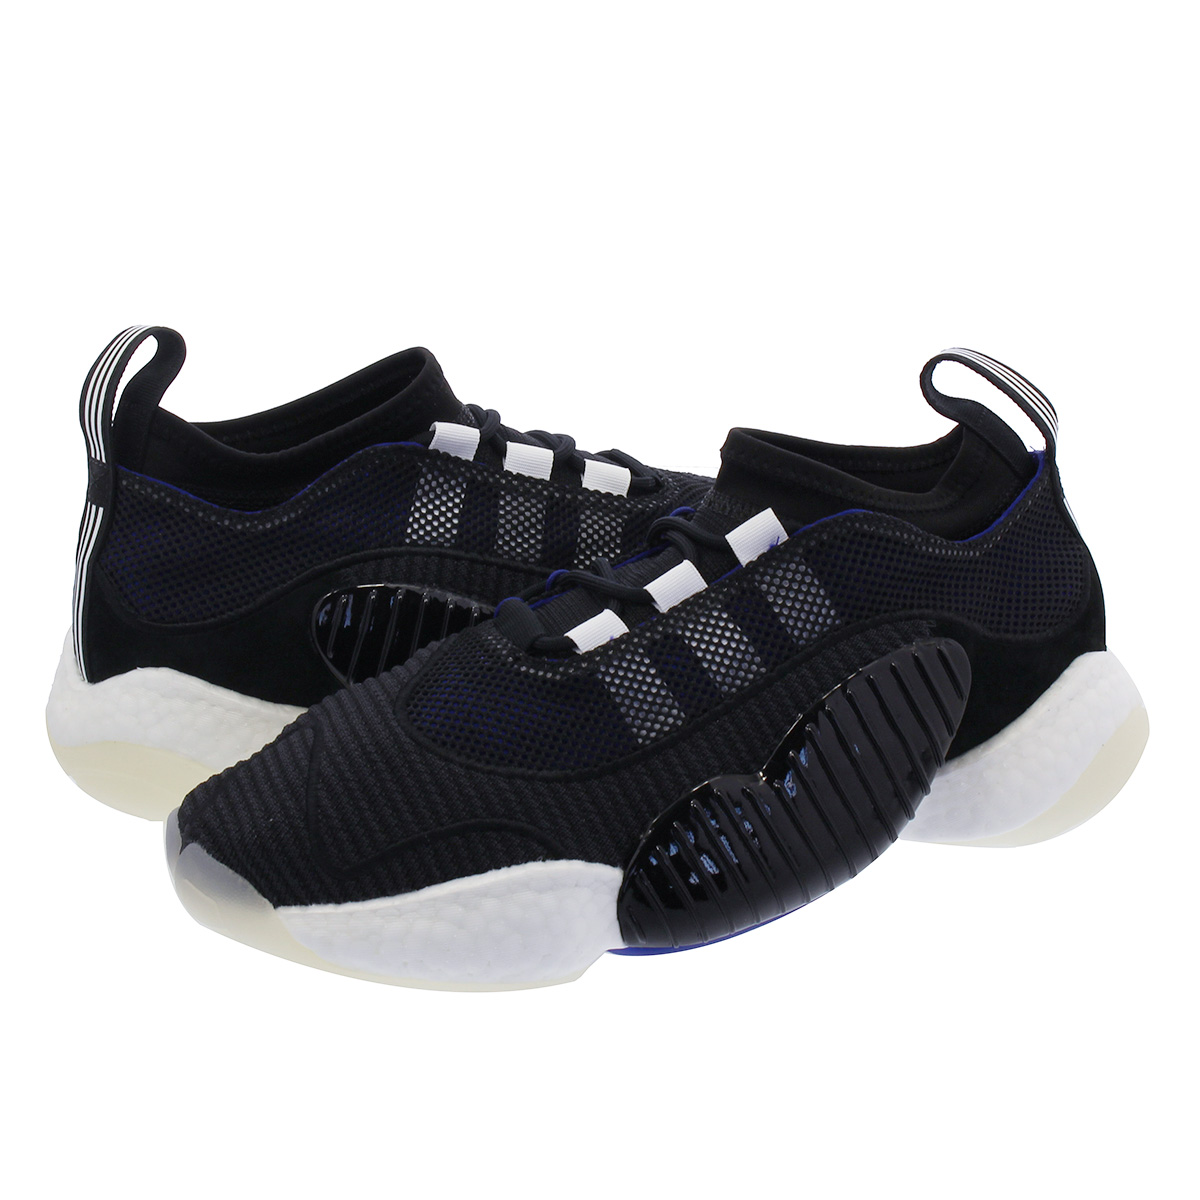 premium selection 73e37 b6136 adidas CRAZY BYW LVL II Adidas crazy BYW LVL II BLACK/PURPLE/WHITE b37552